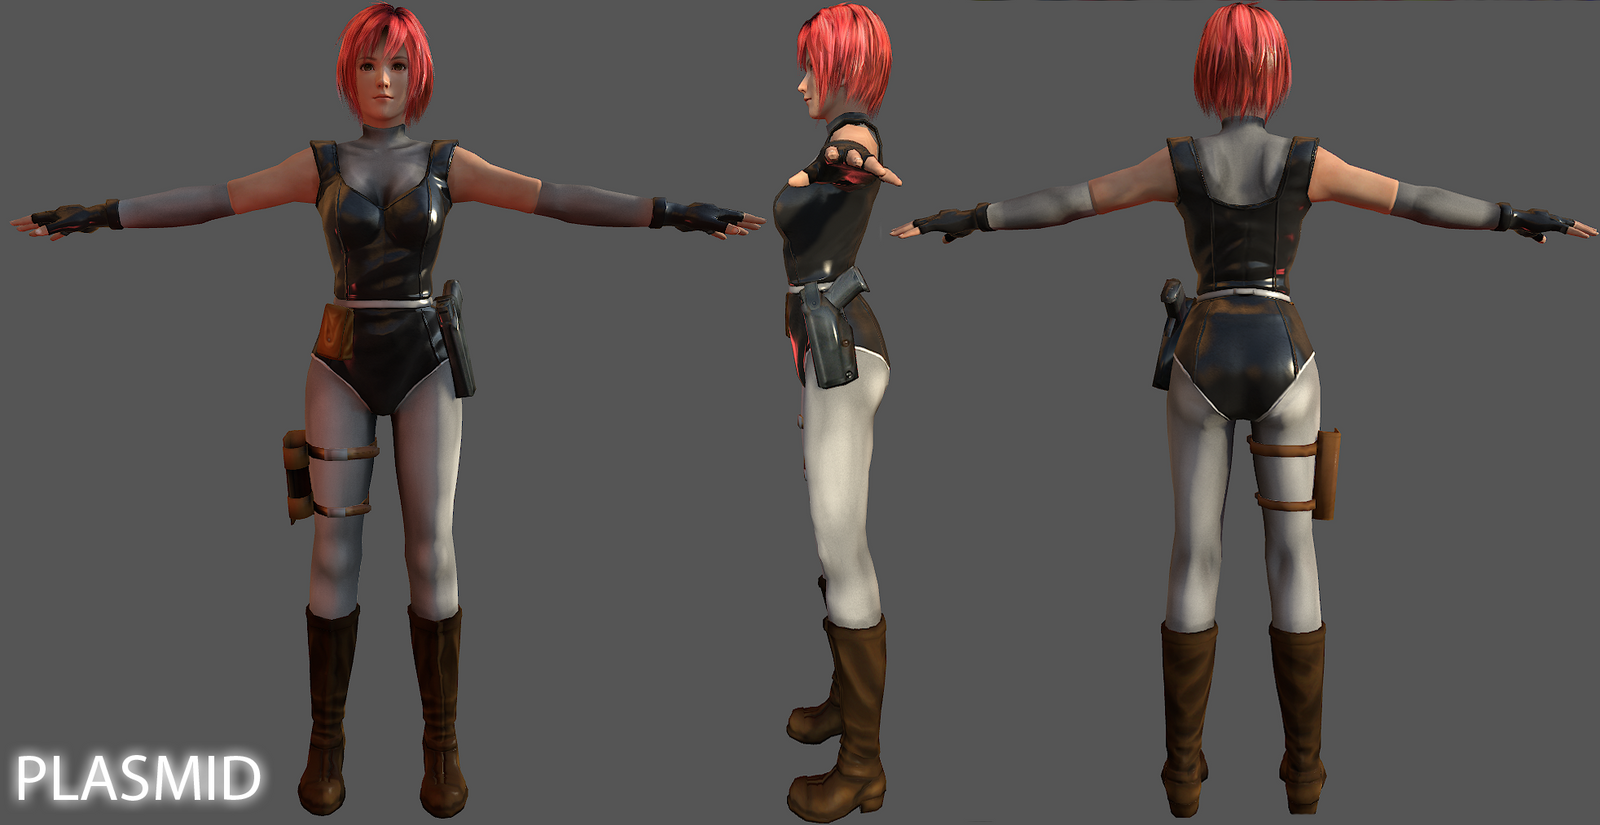 Sexy alyx vance costume pics softcore images